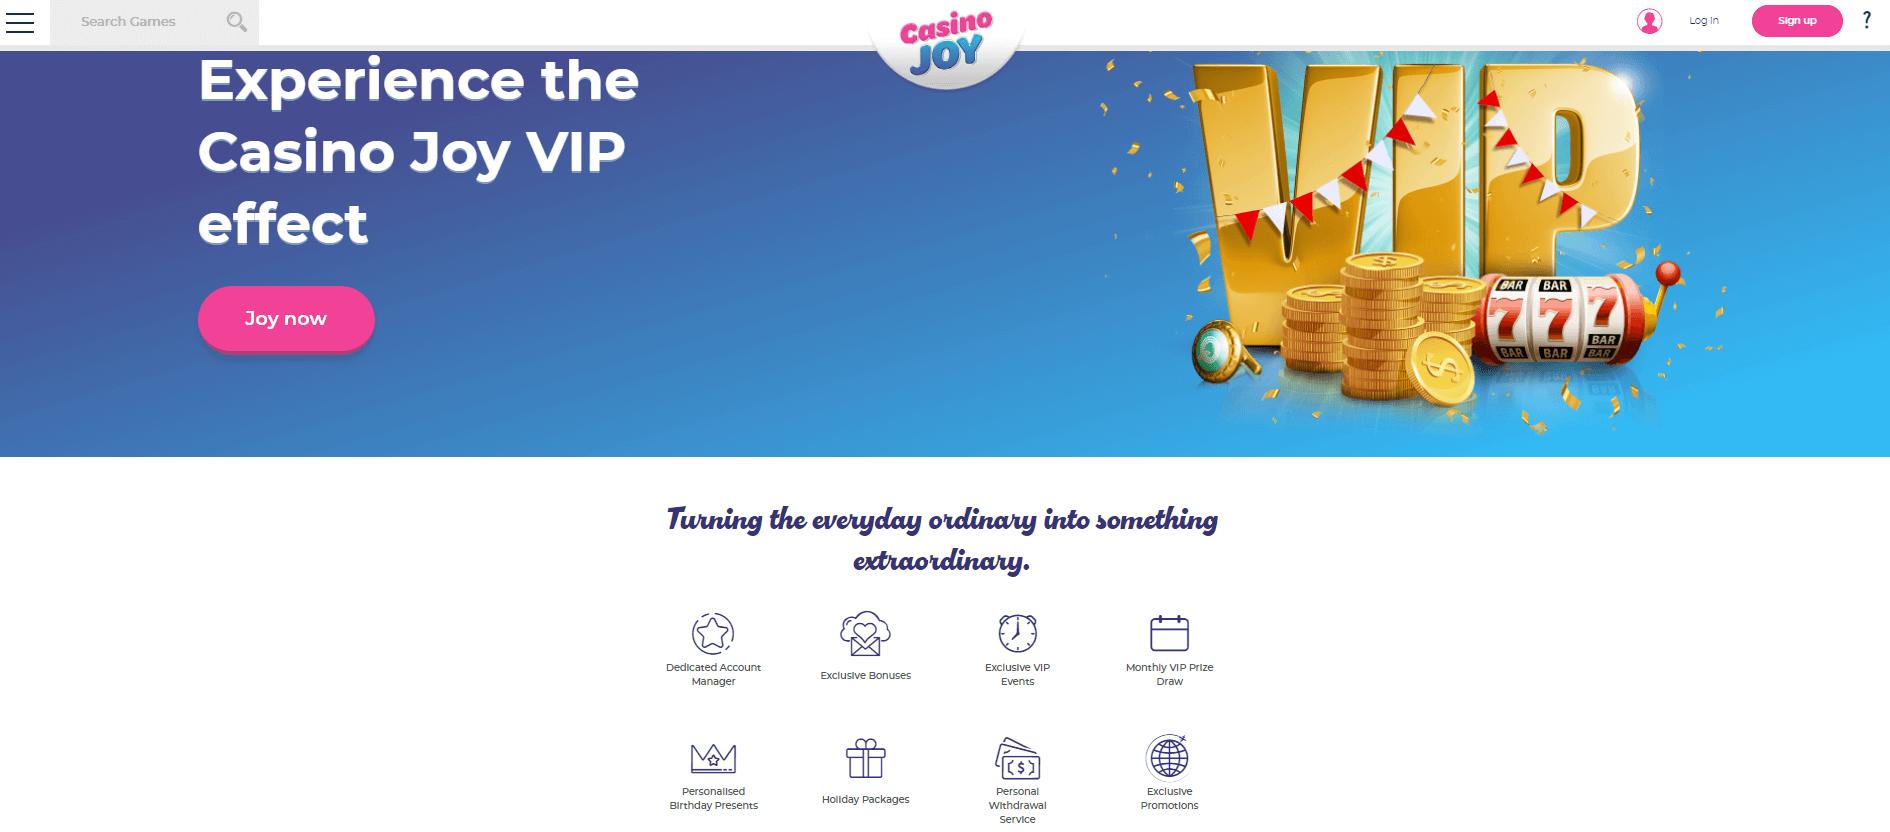 Casino Joy VIP